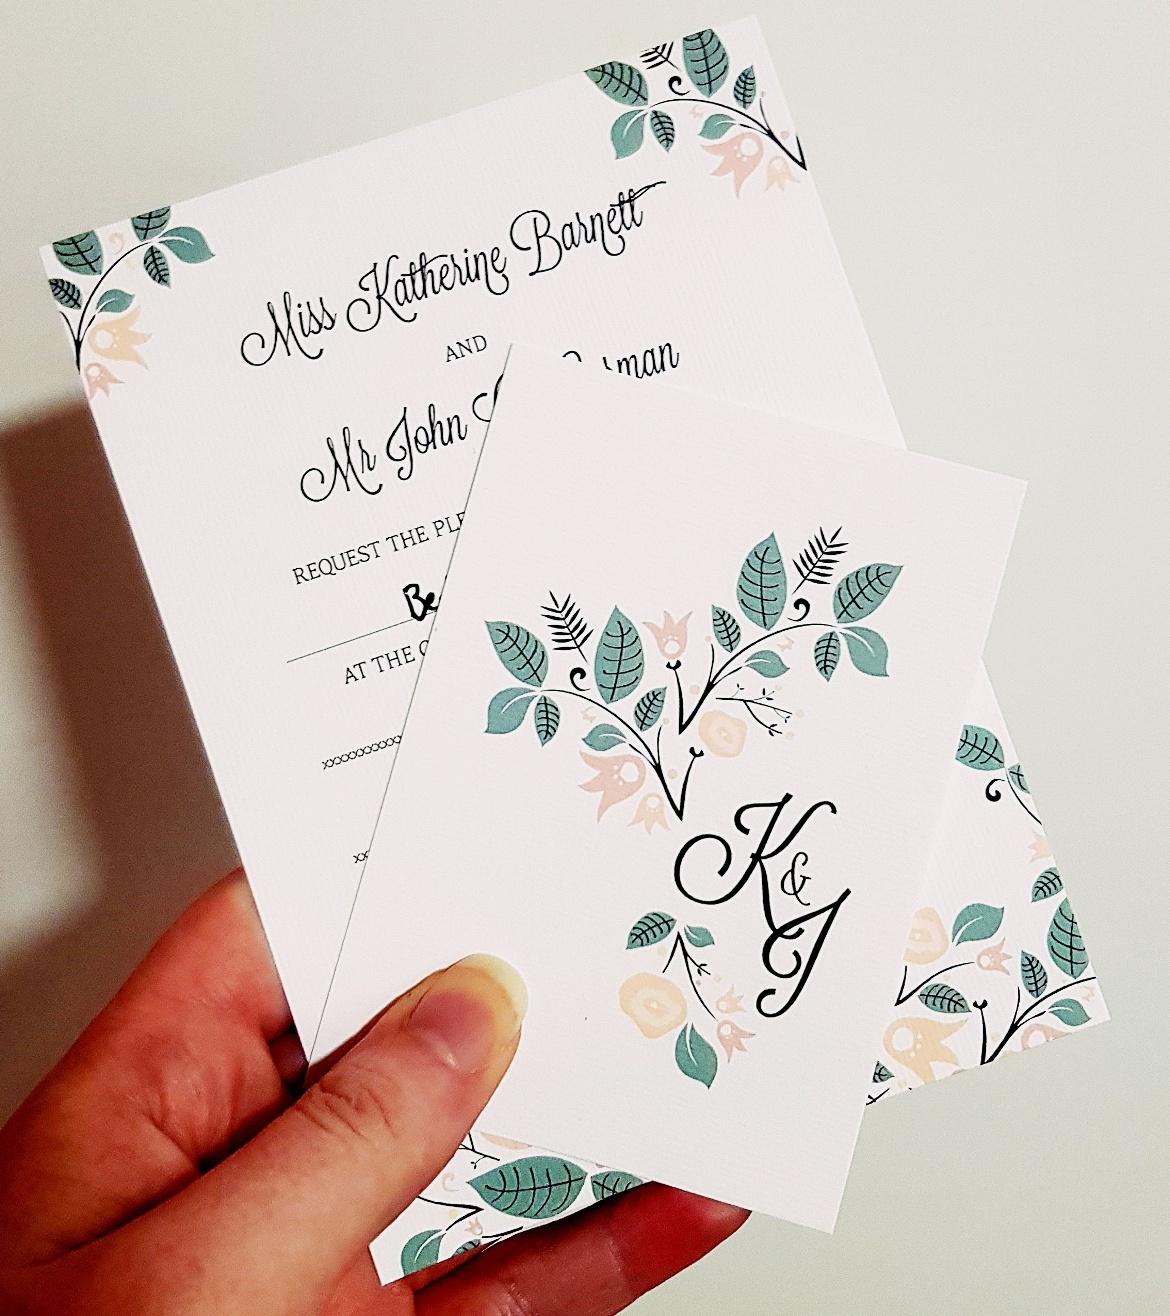 Wedding invite - January 2018 Monthly Recap by BeckyBecky Blogs